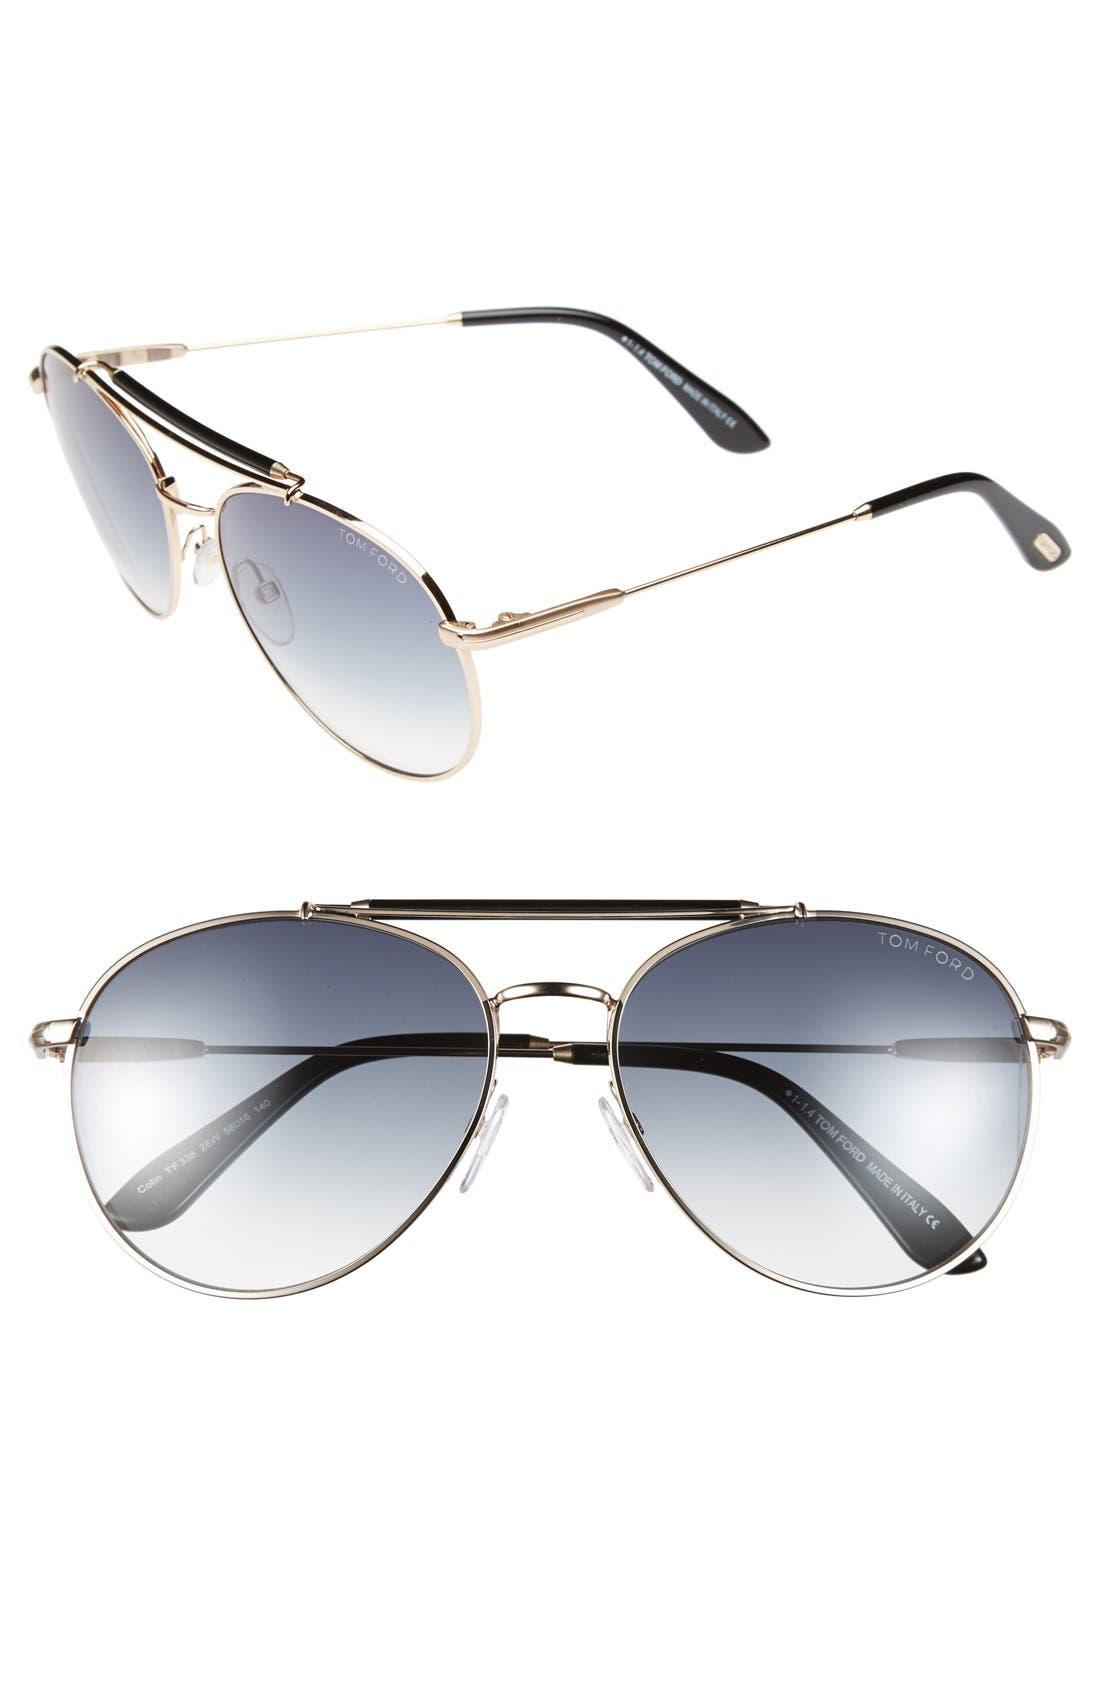 Main Image - Tom Ford 'Colin' 58mm Aviator Sunglasses